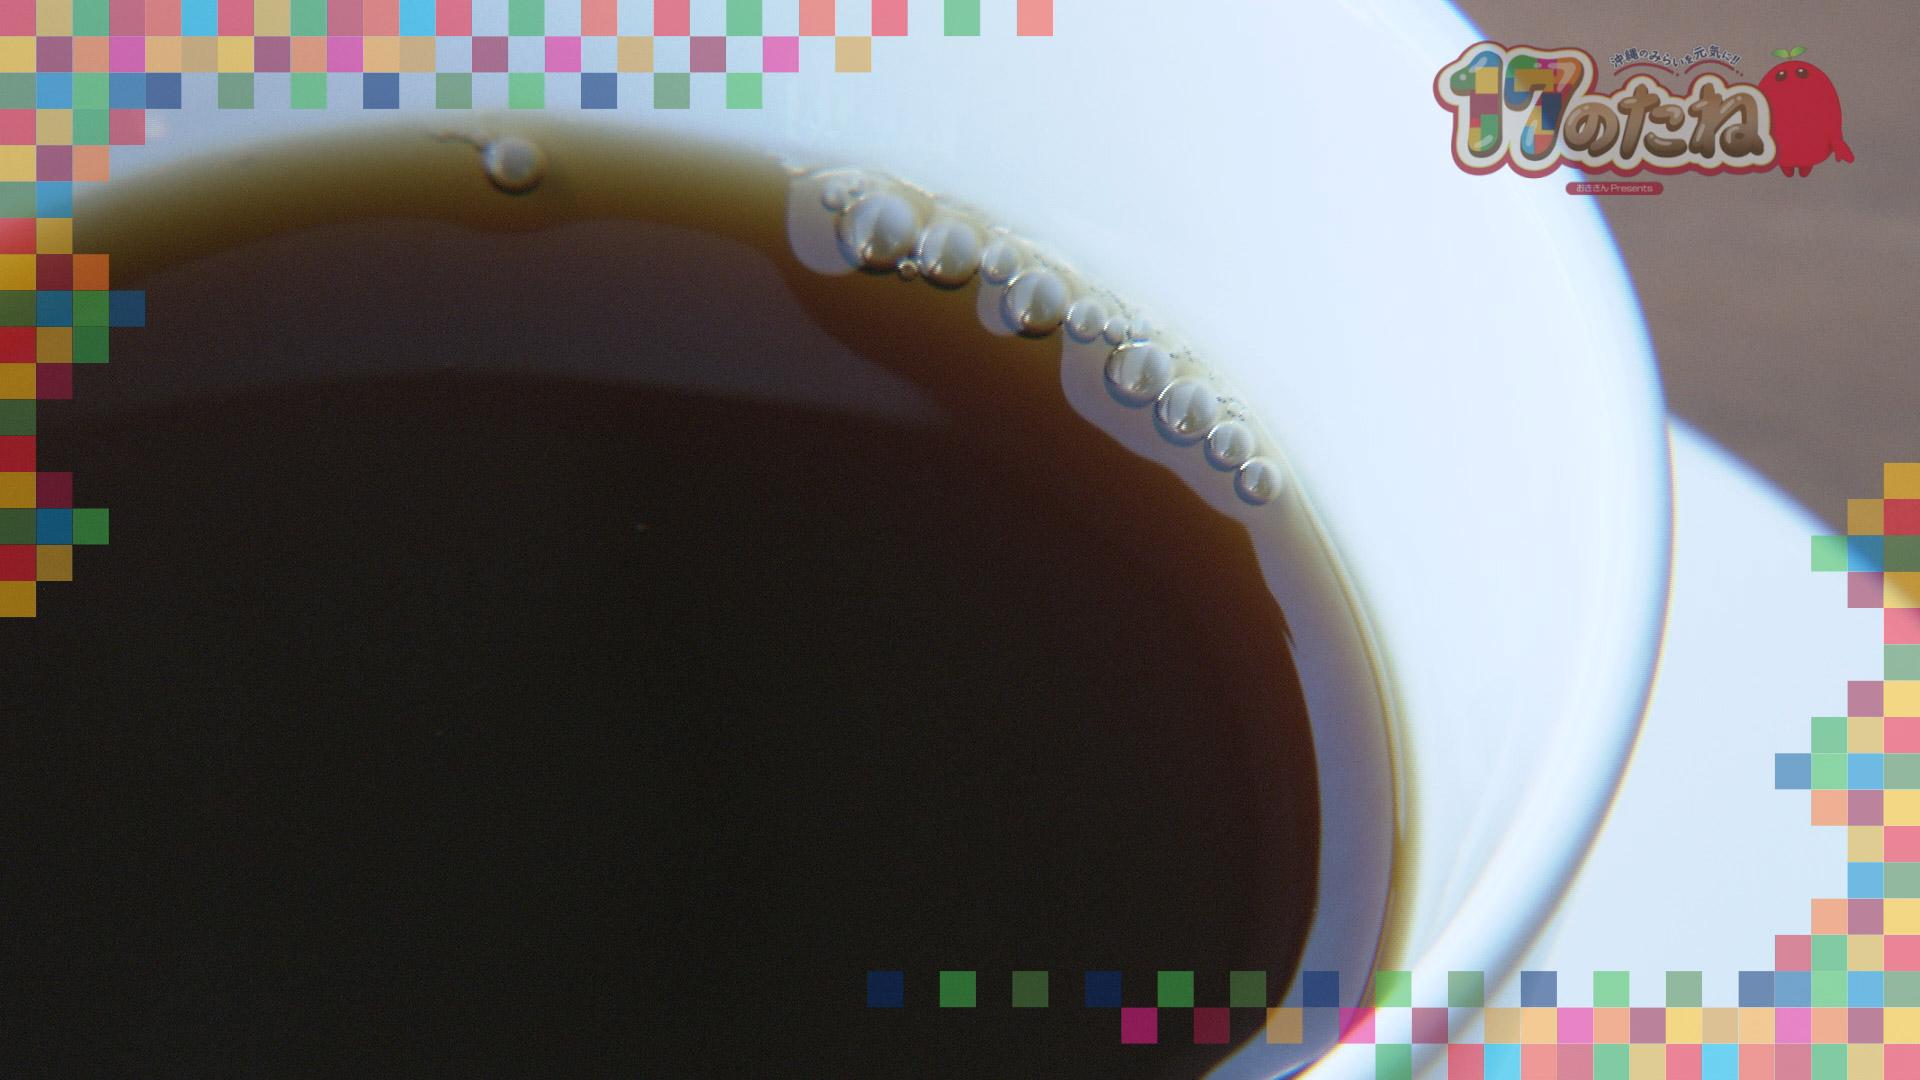 #18「又吉コーヒー園」9月14日放送